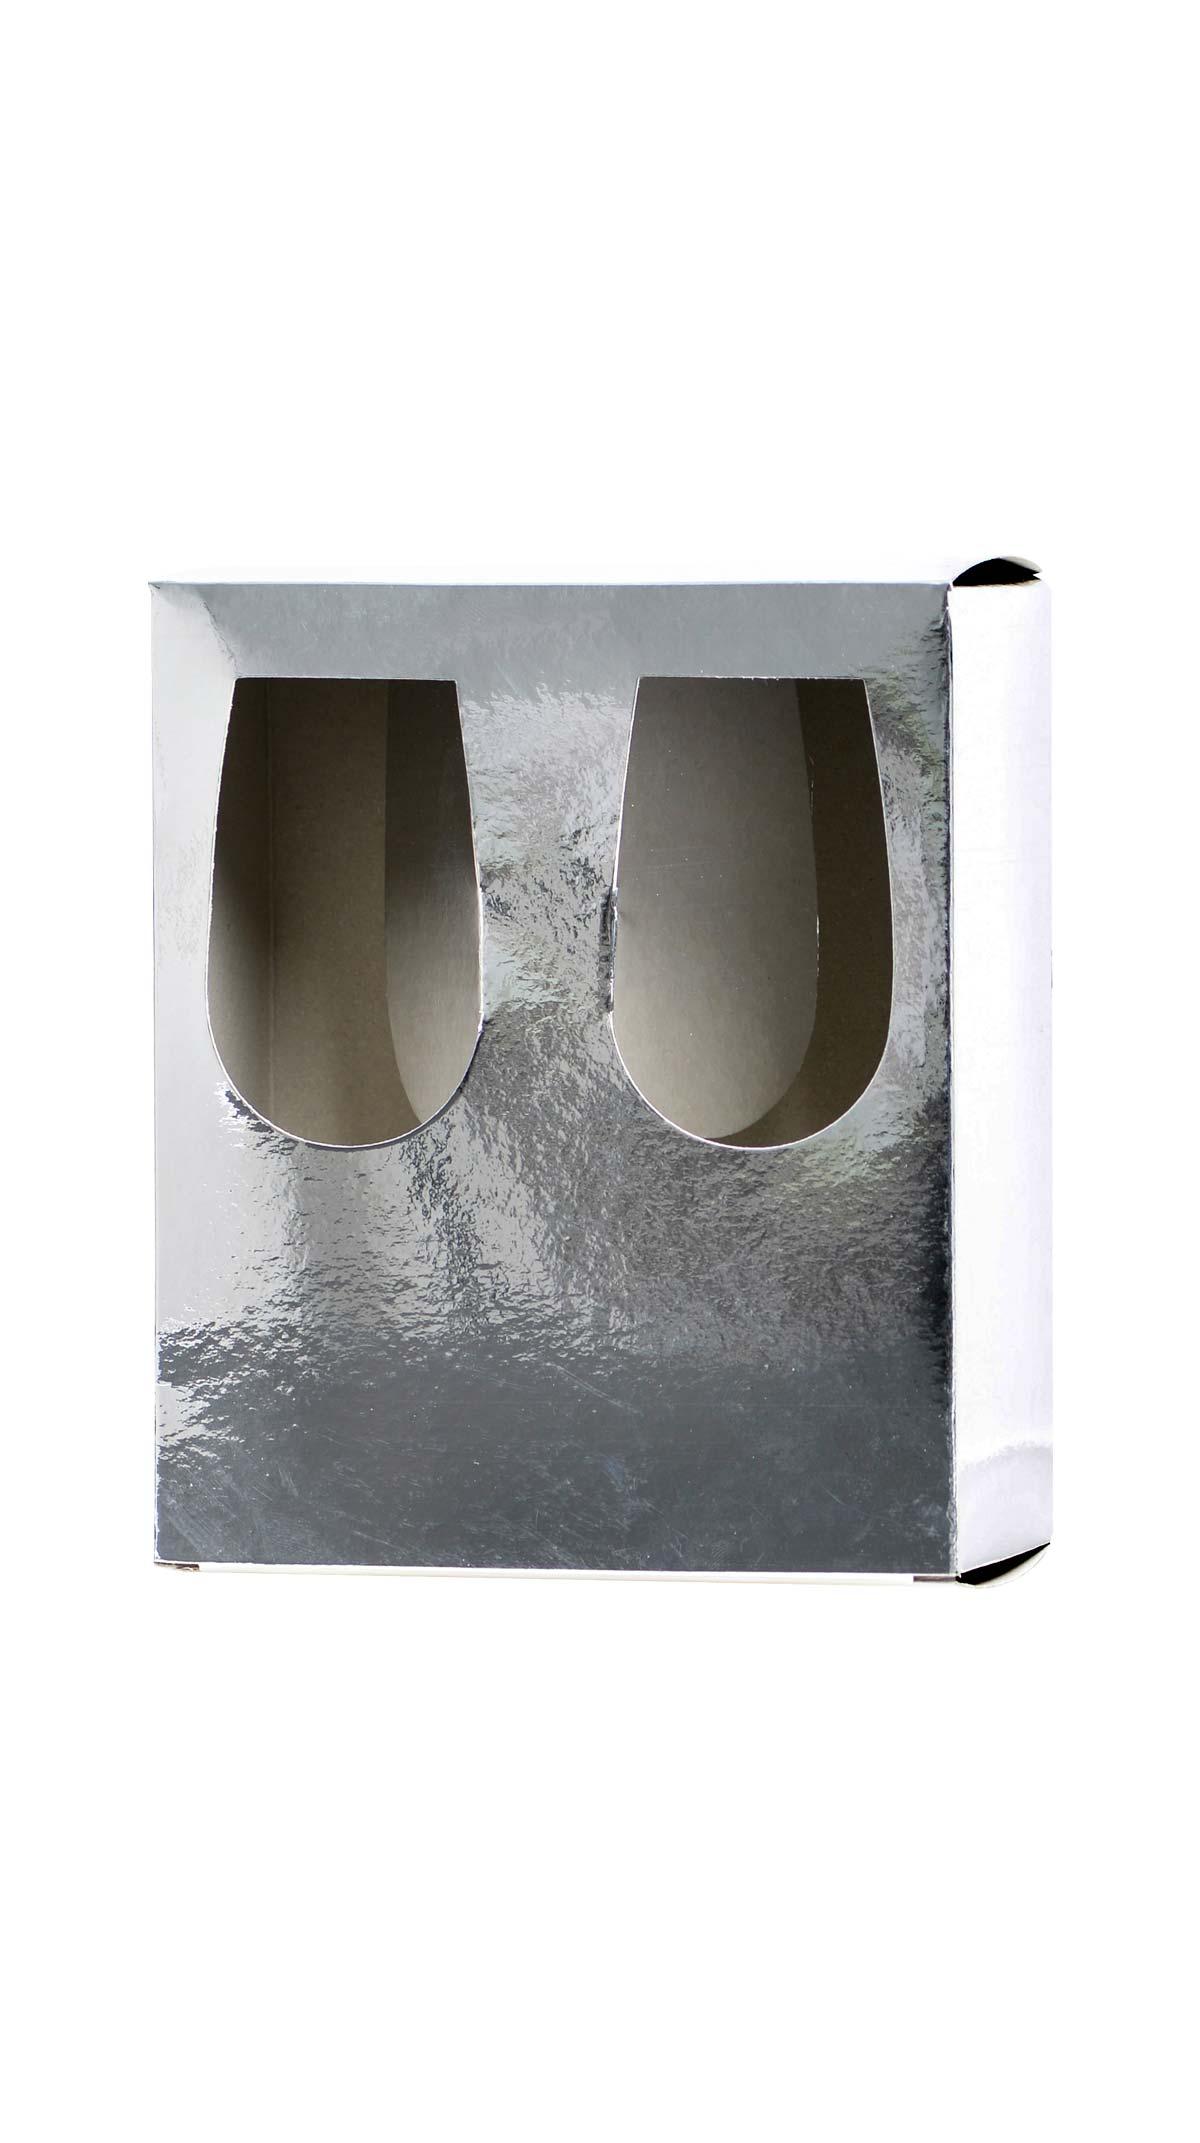 Estuche 2 catavinos Plata 15,5cl - Serigrafía Casbe